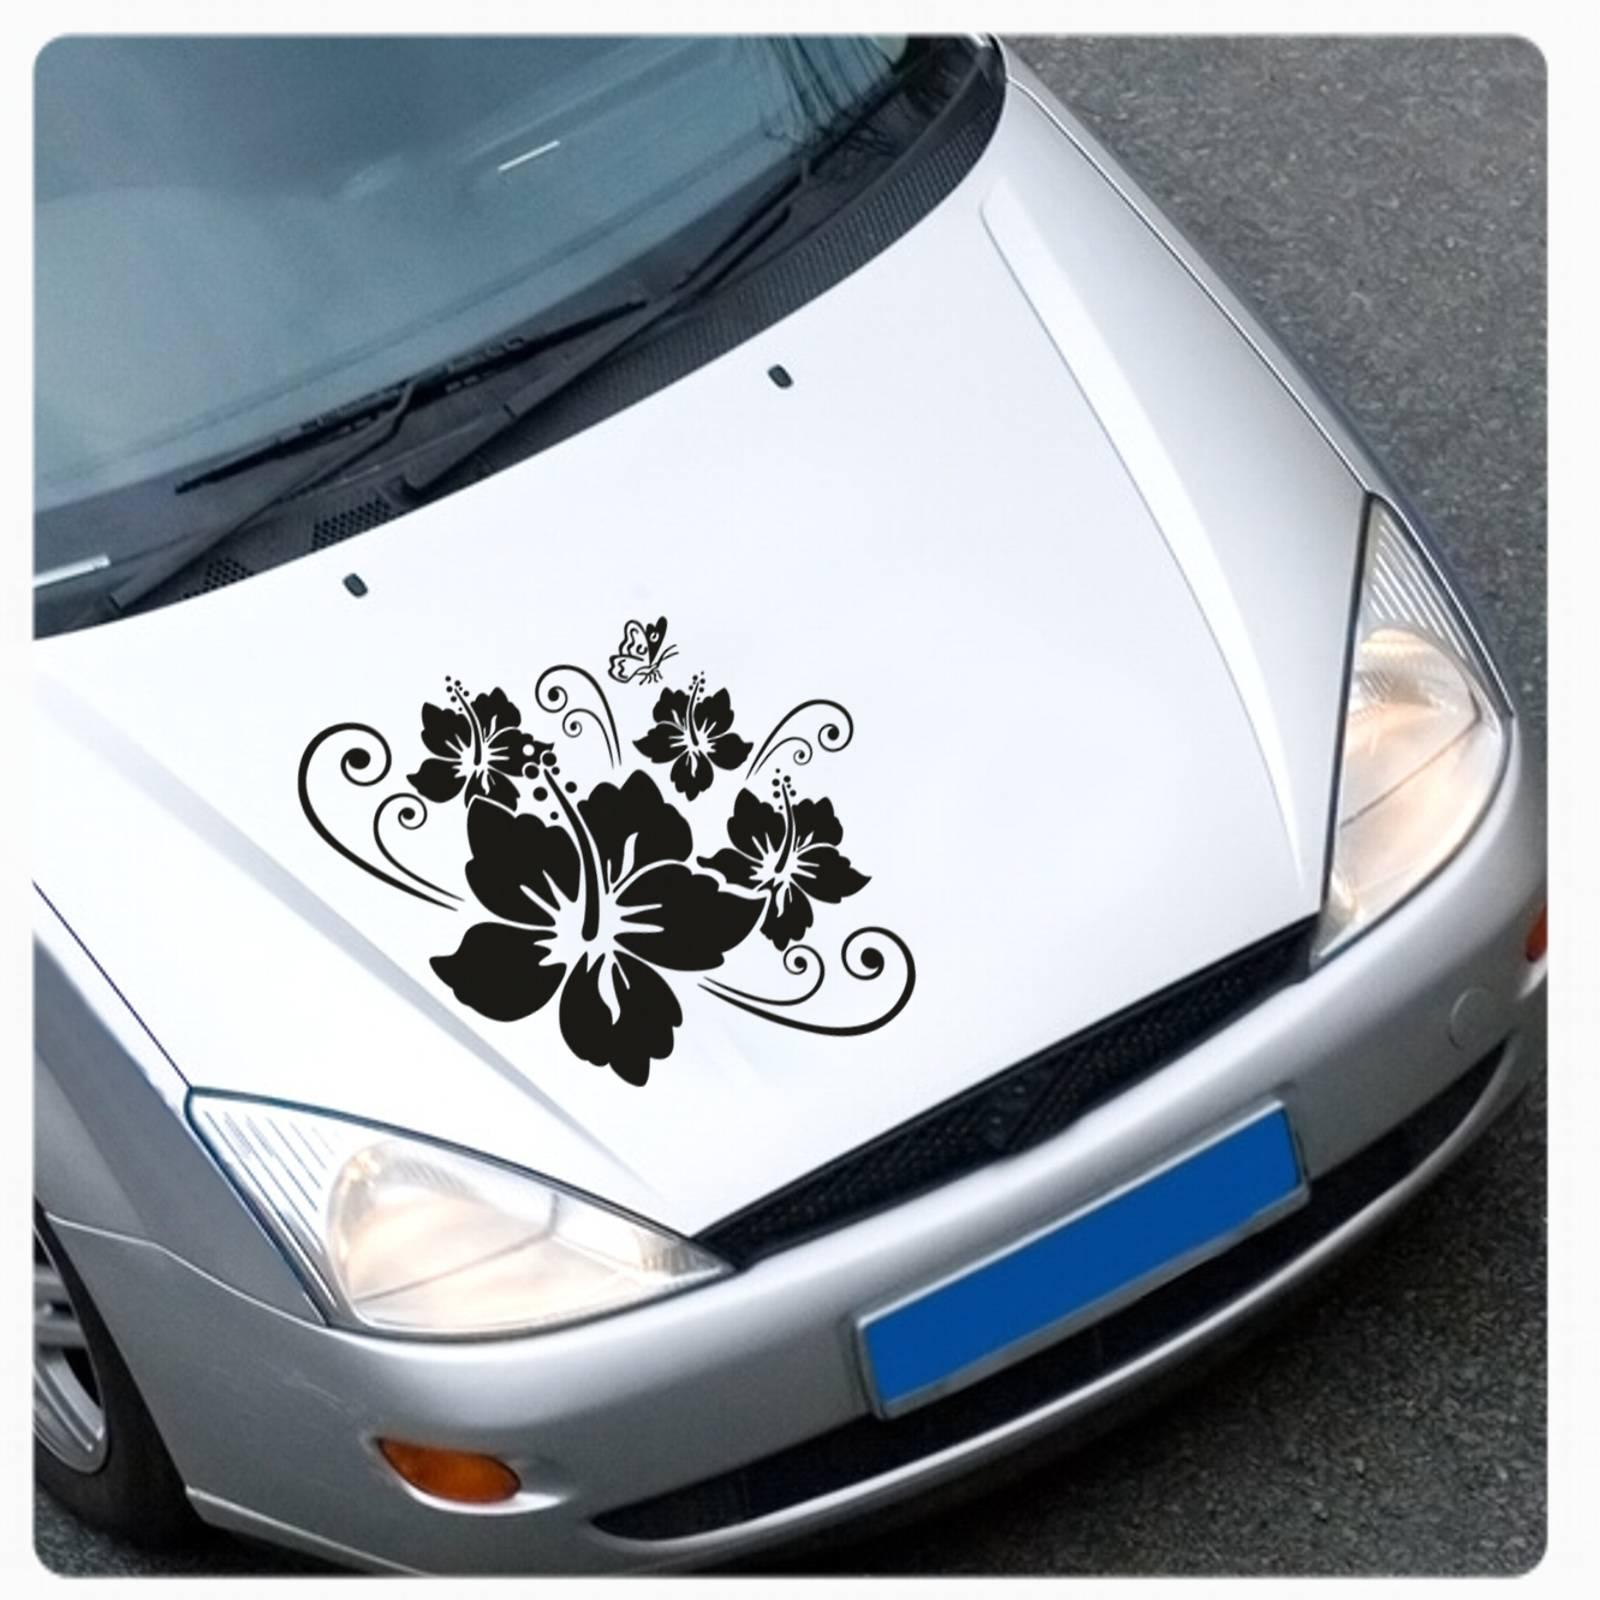 Tier Schmetterling Folie Tribal Auto Aufkleber